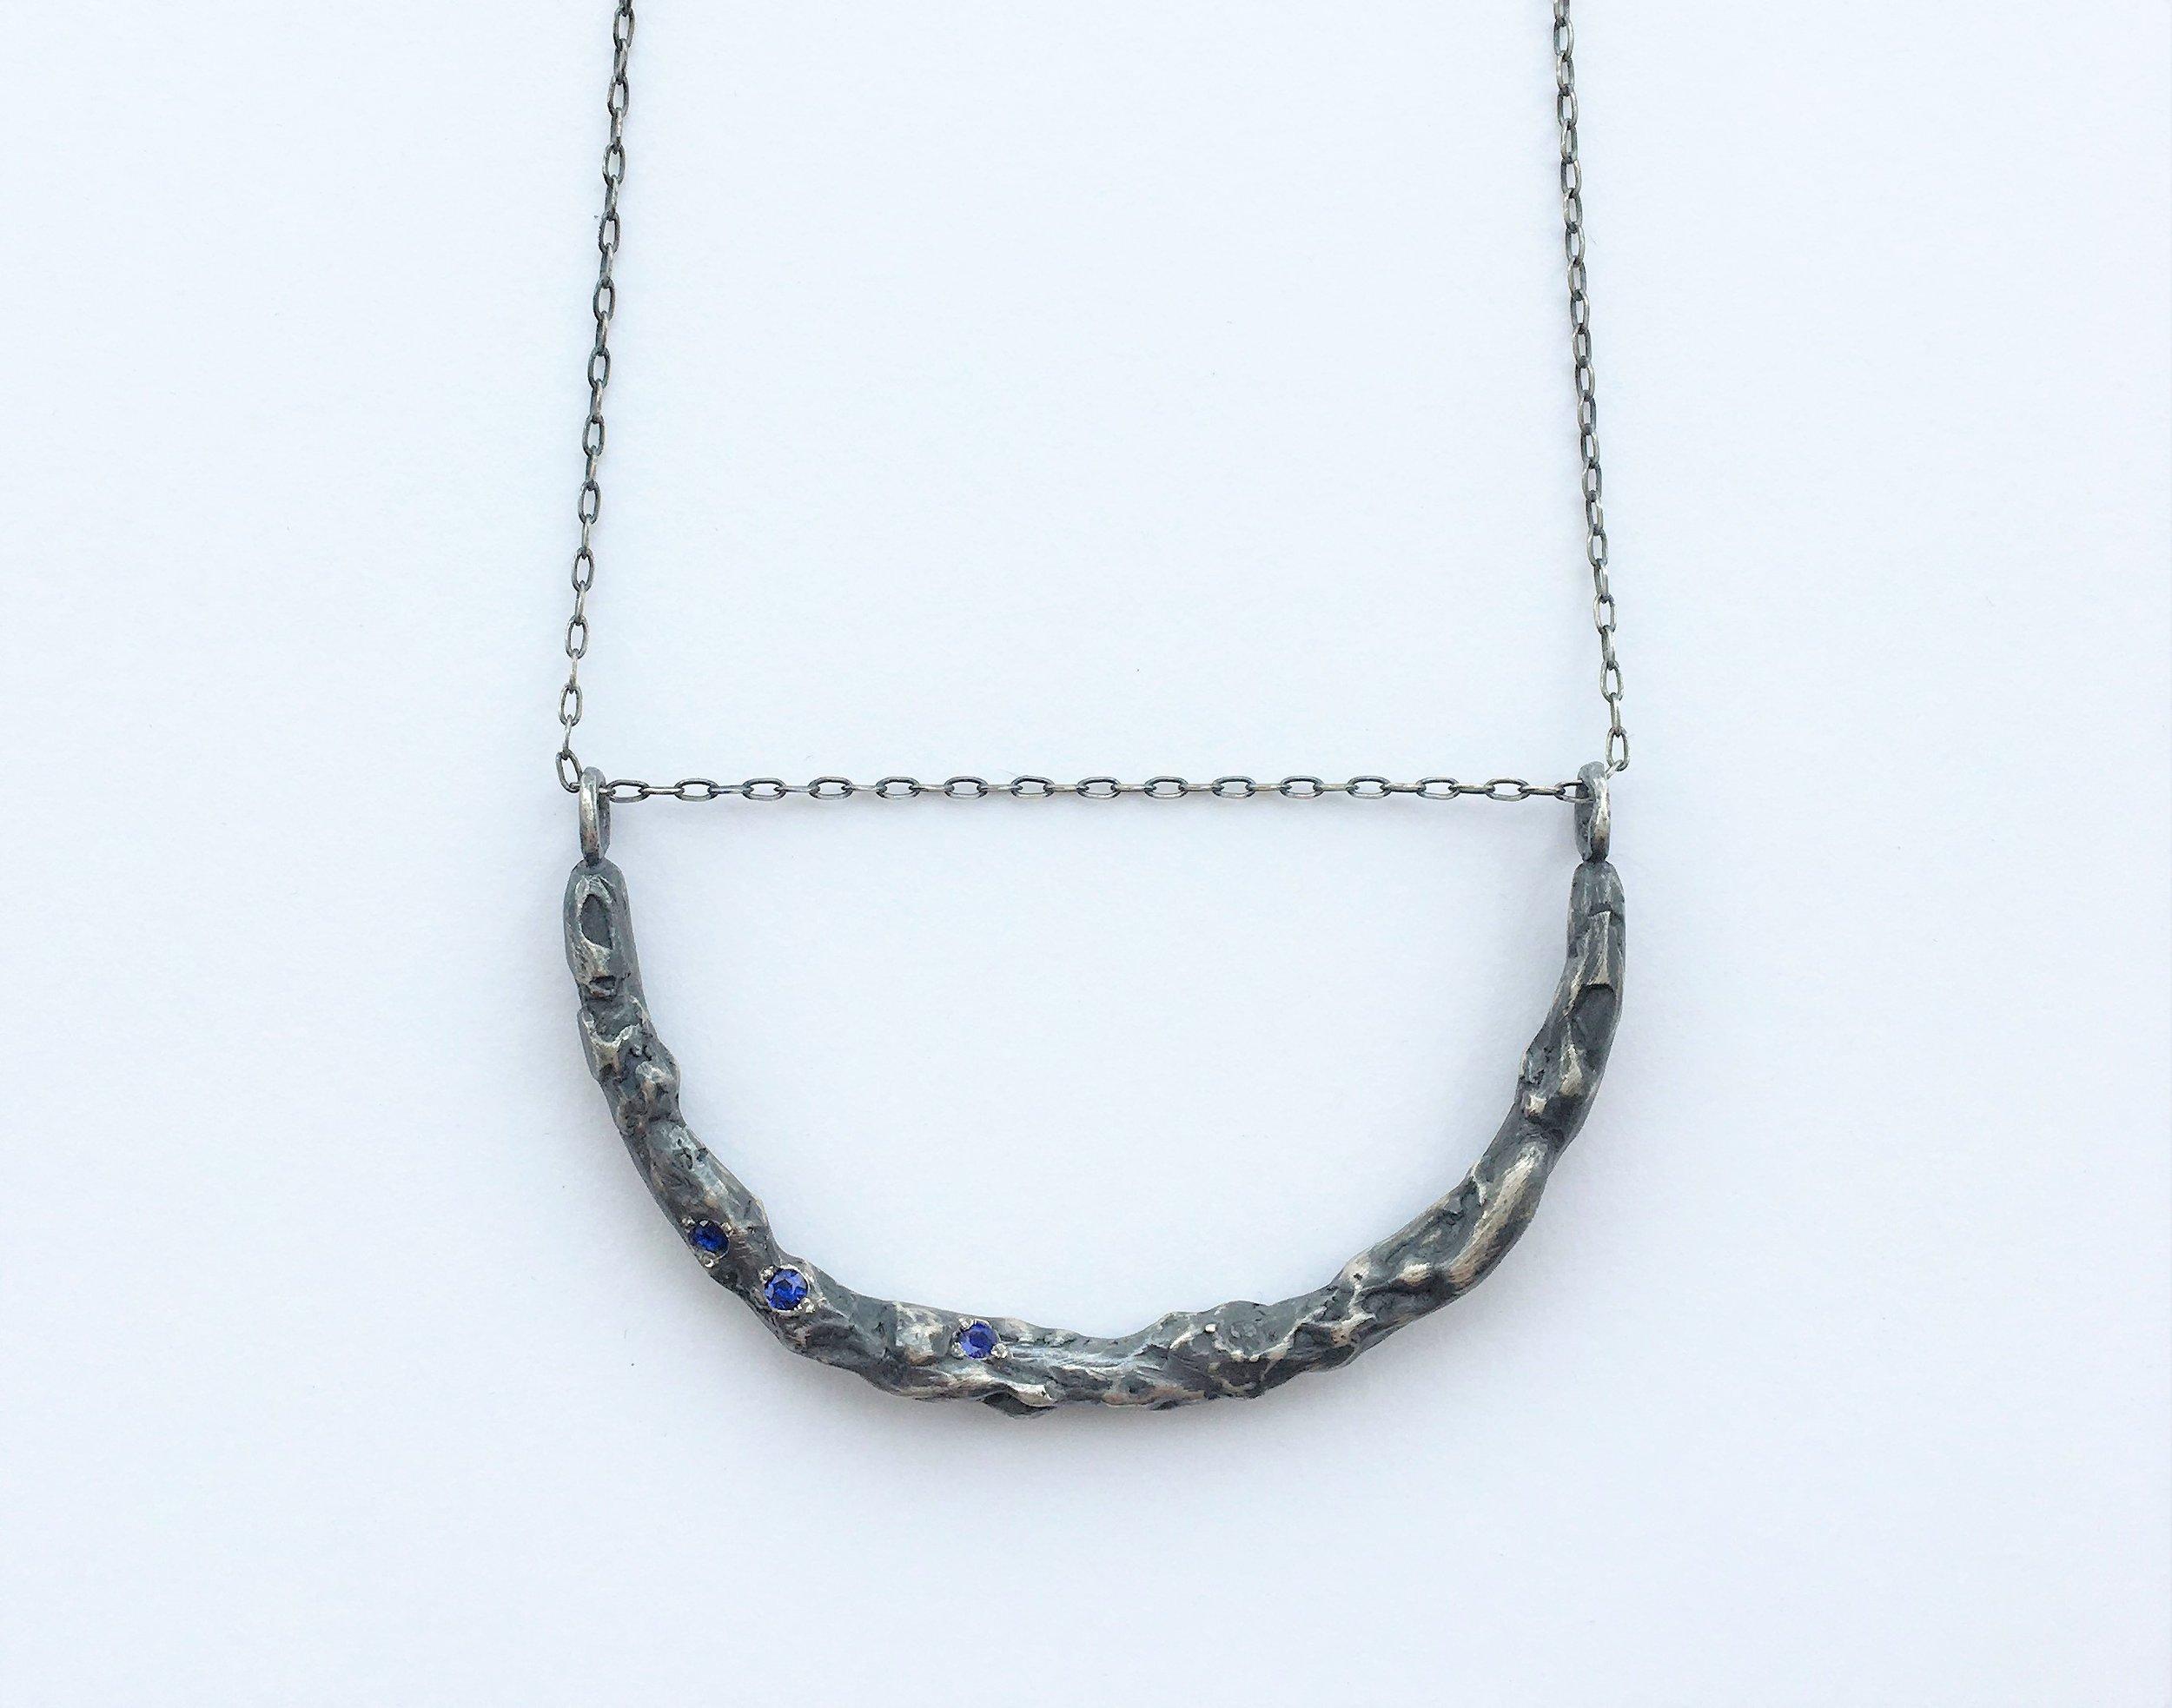 Eden Silver-Myer